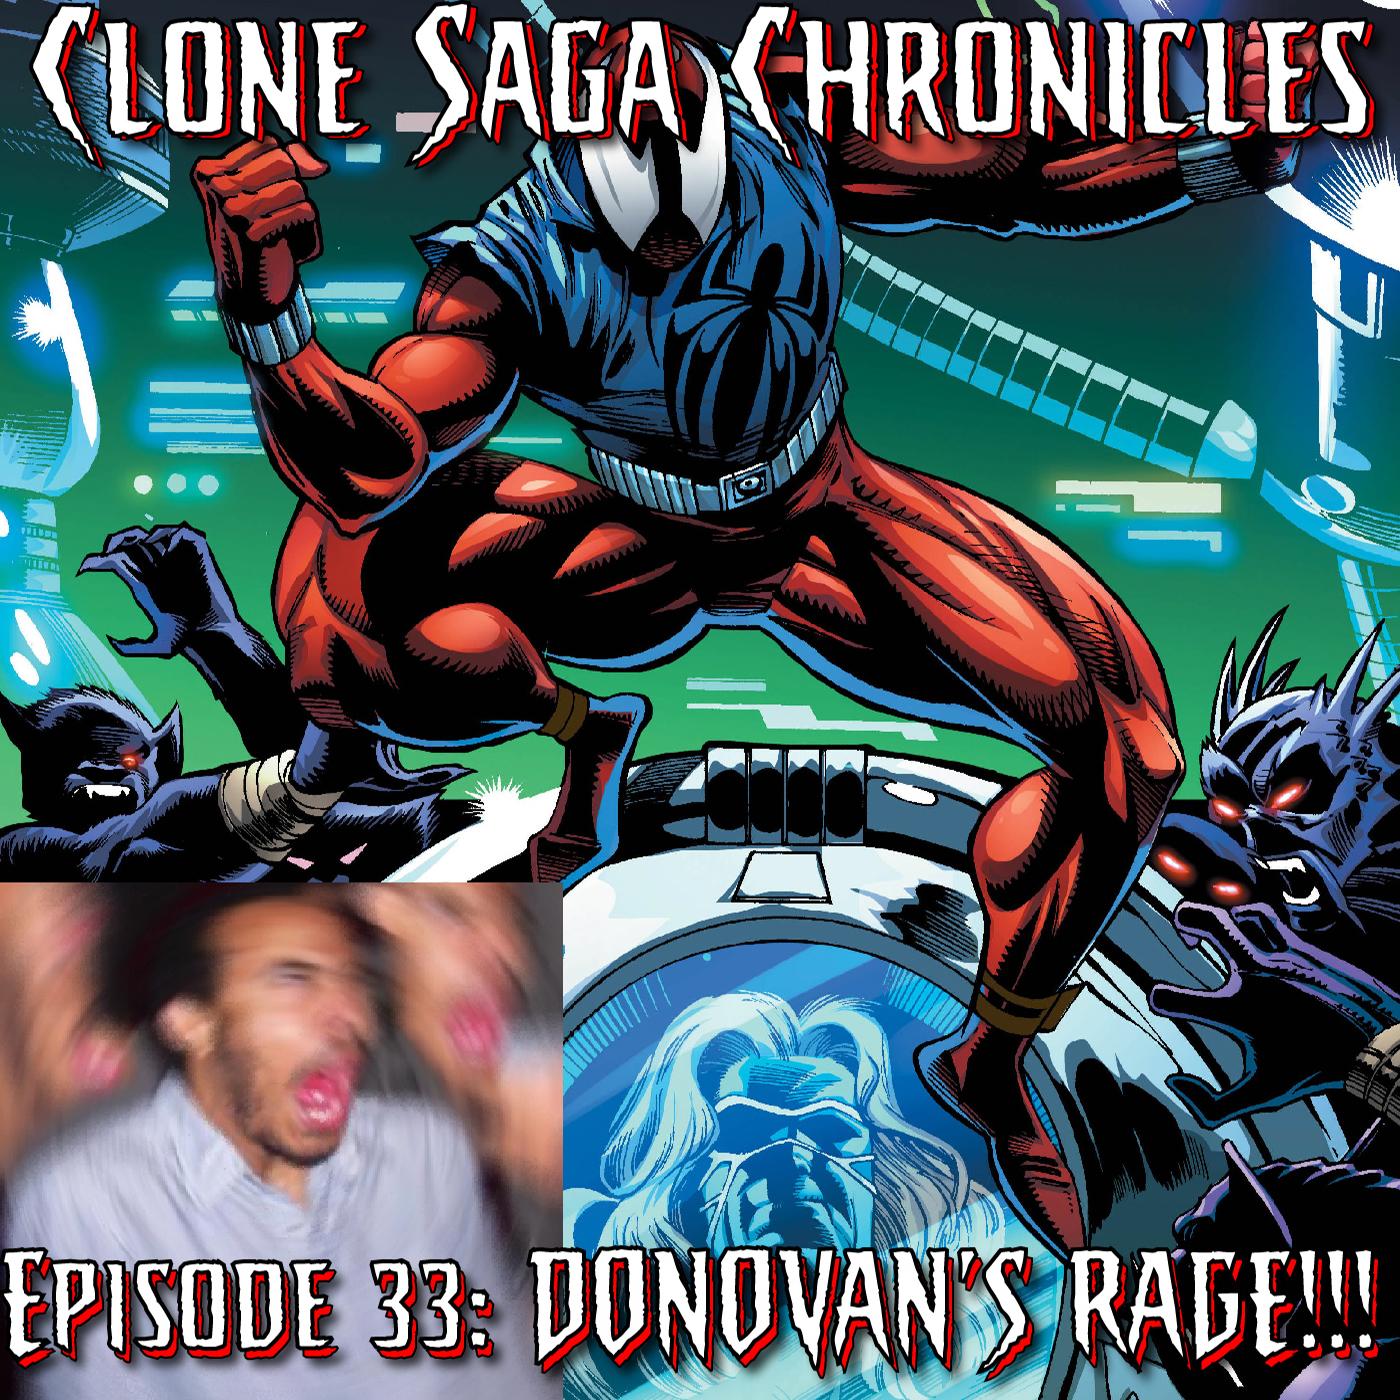 CSC Episode 33: Donovan's RAGE! (Scarlet Spider Unlimited 1, Cover date November 1995)